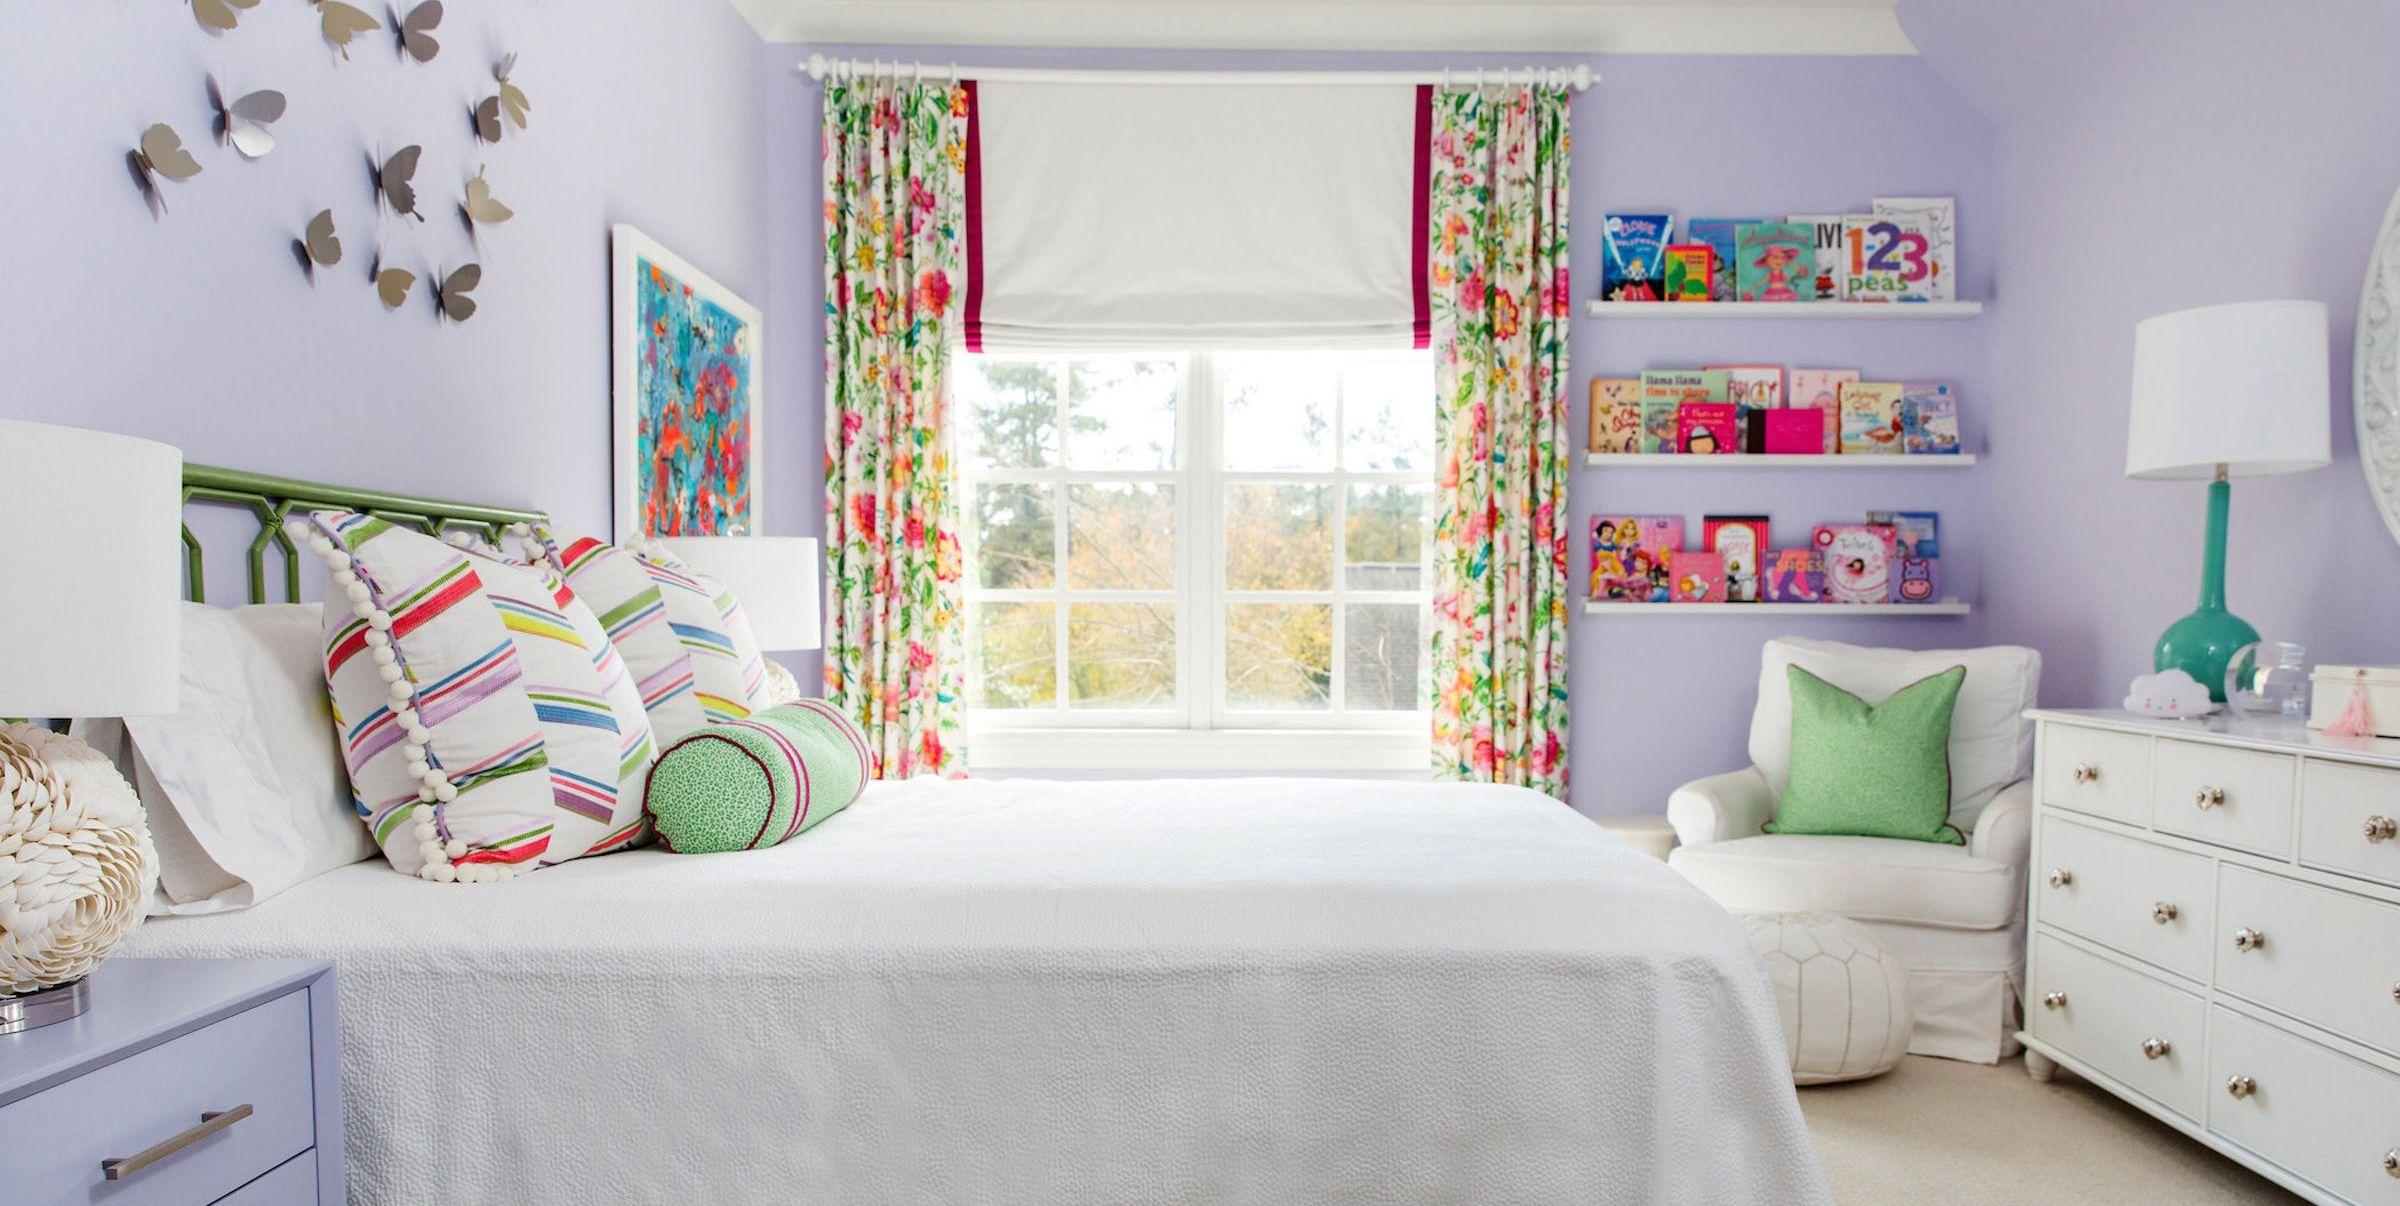 girls room decor ideas 15 Creative Girls Room Ideas   How to Decorate a Girl's Bedroom girls room decor ideas